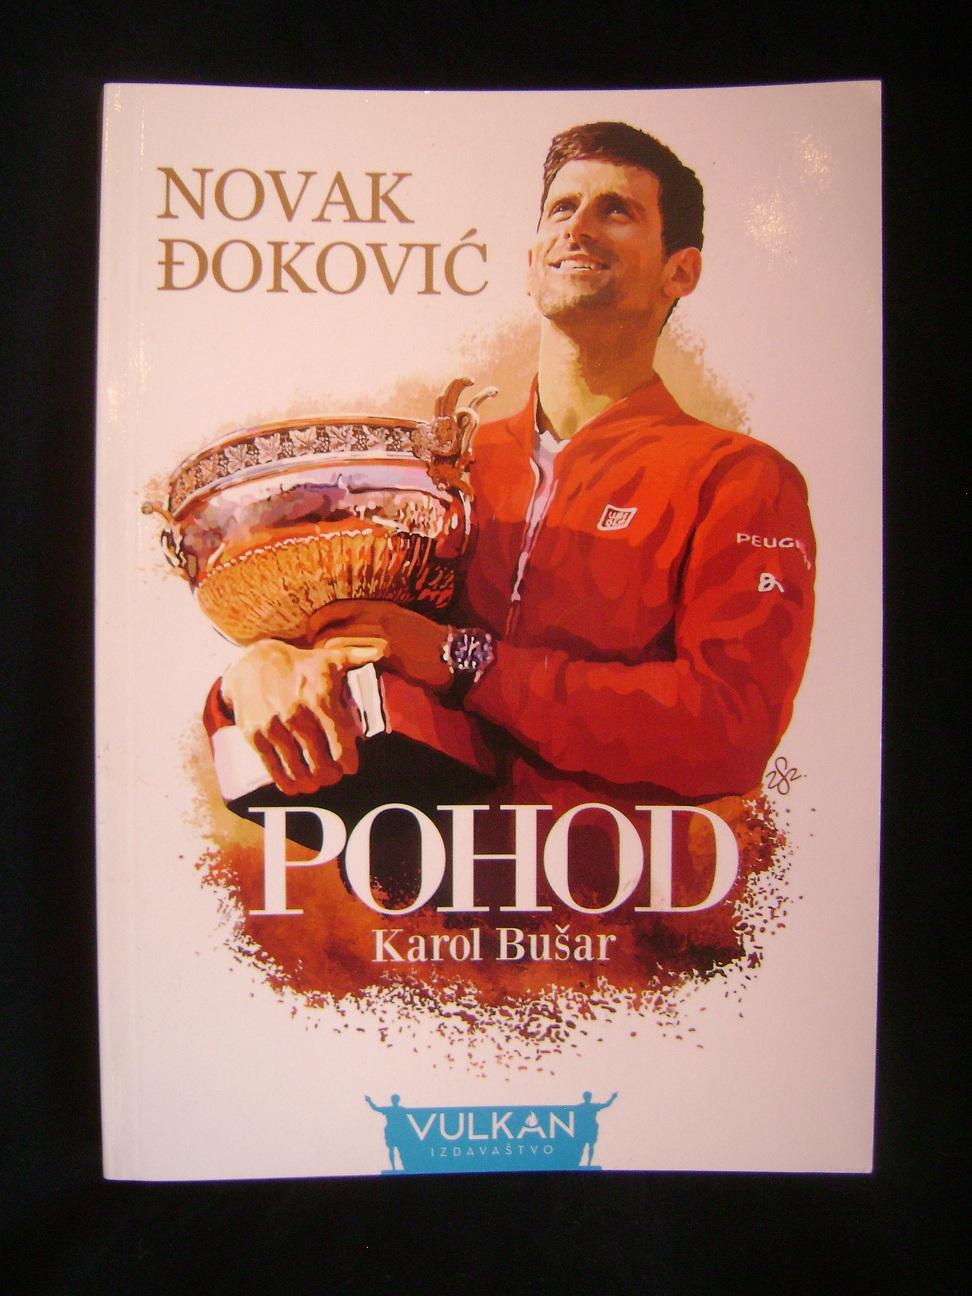 Novak_Đokovic_Pohod.JPG